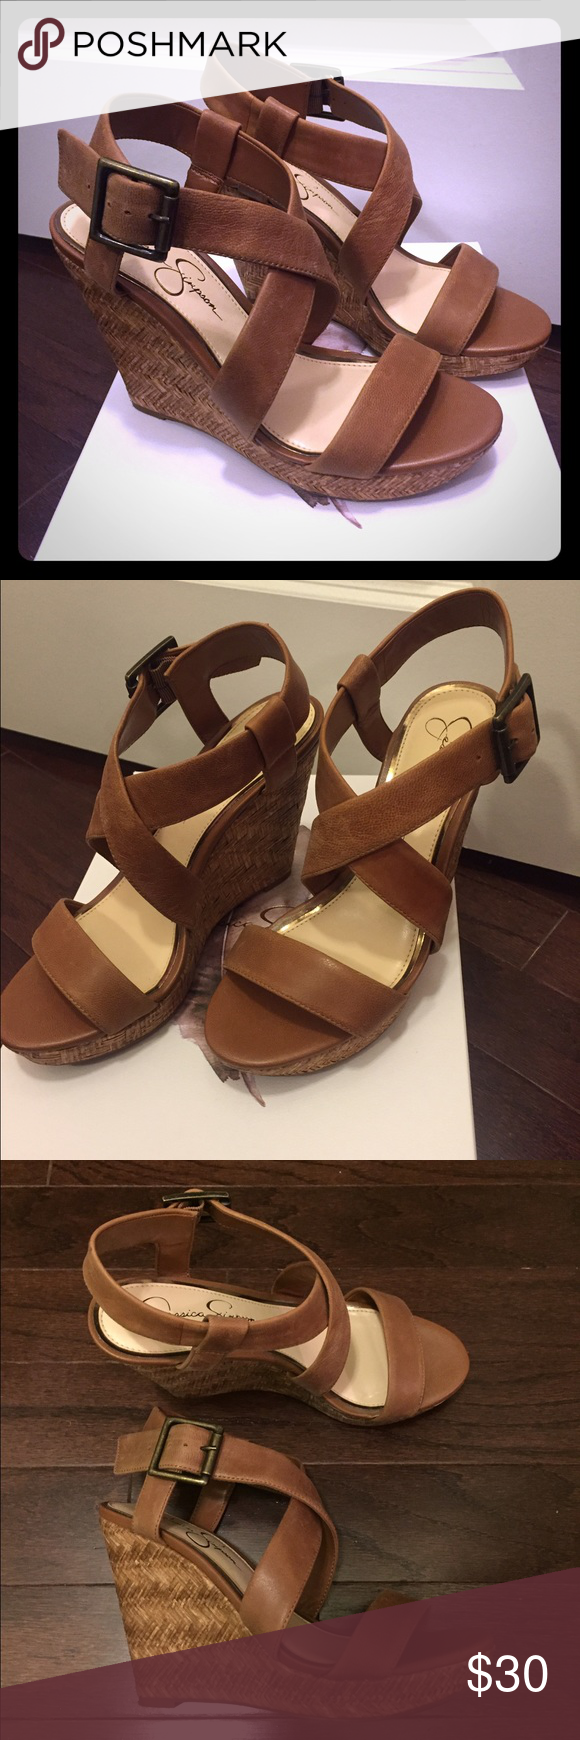 Jessica Simpson Joliet Wedges Cute Wedge Sandle. Worn twice. Jessica Simpson Shoes Wedges